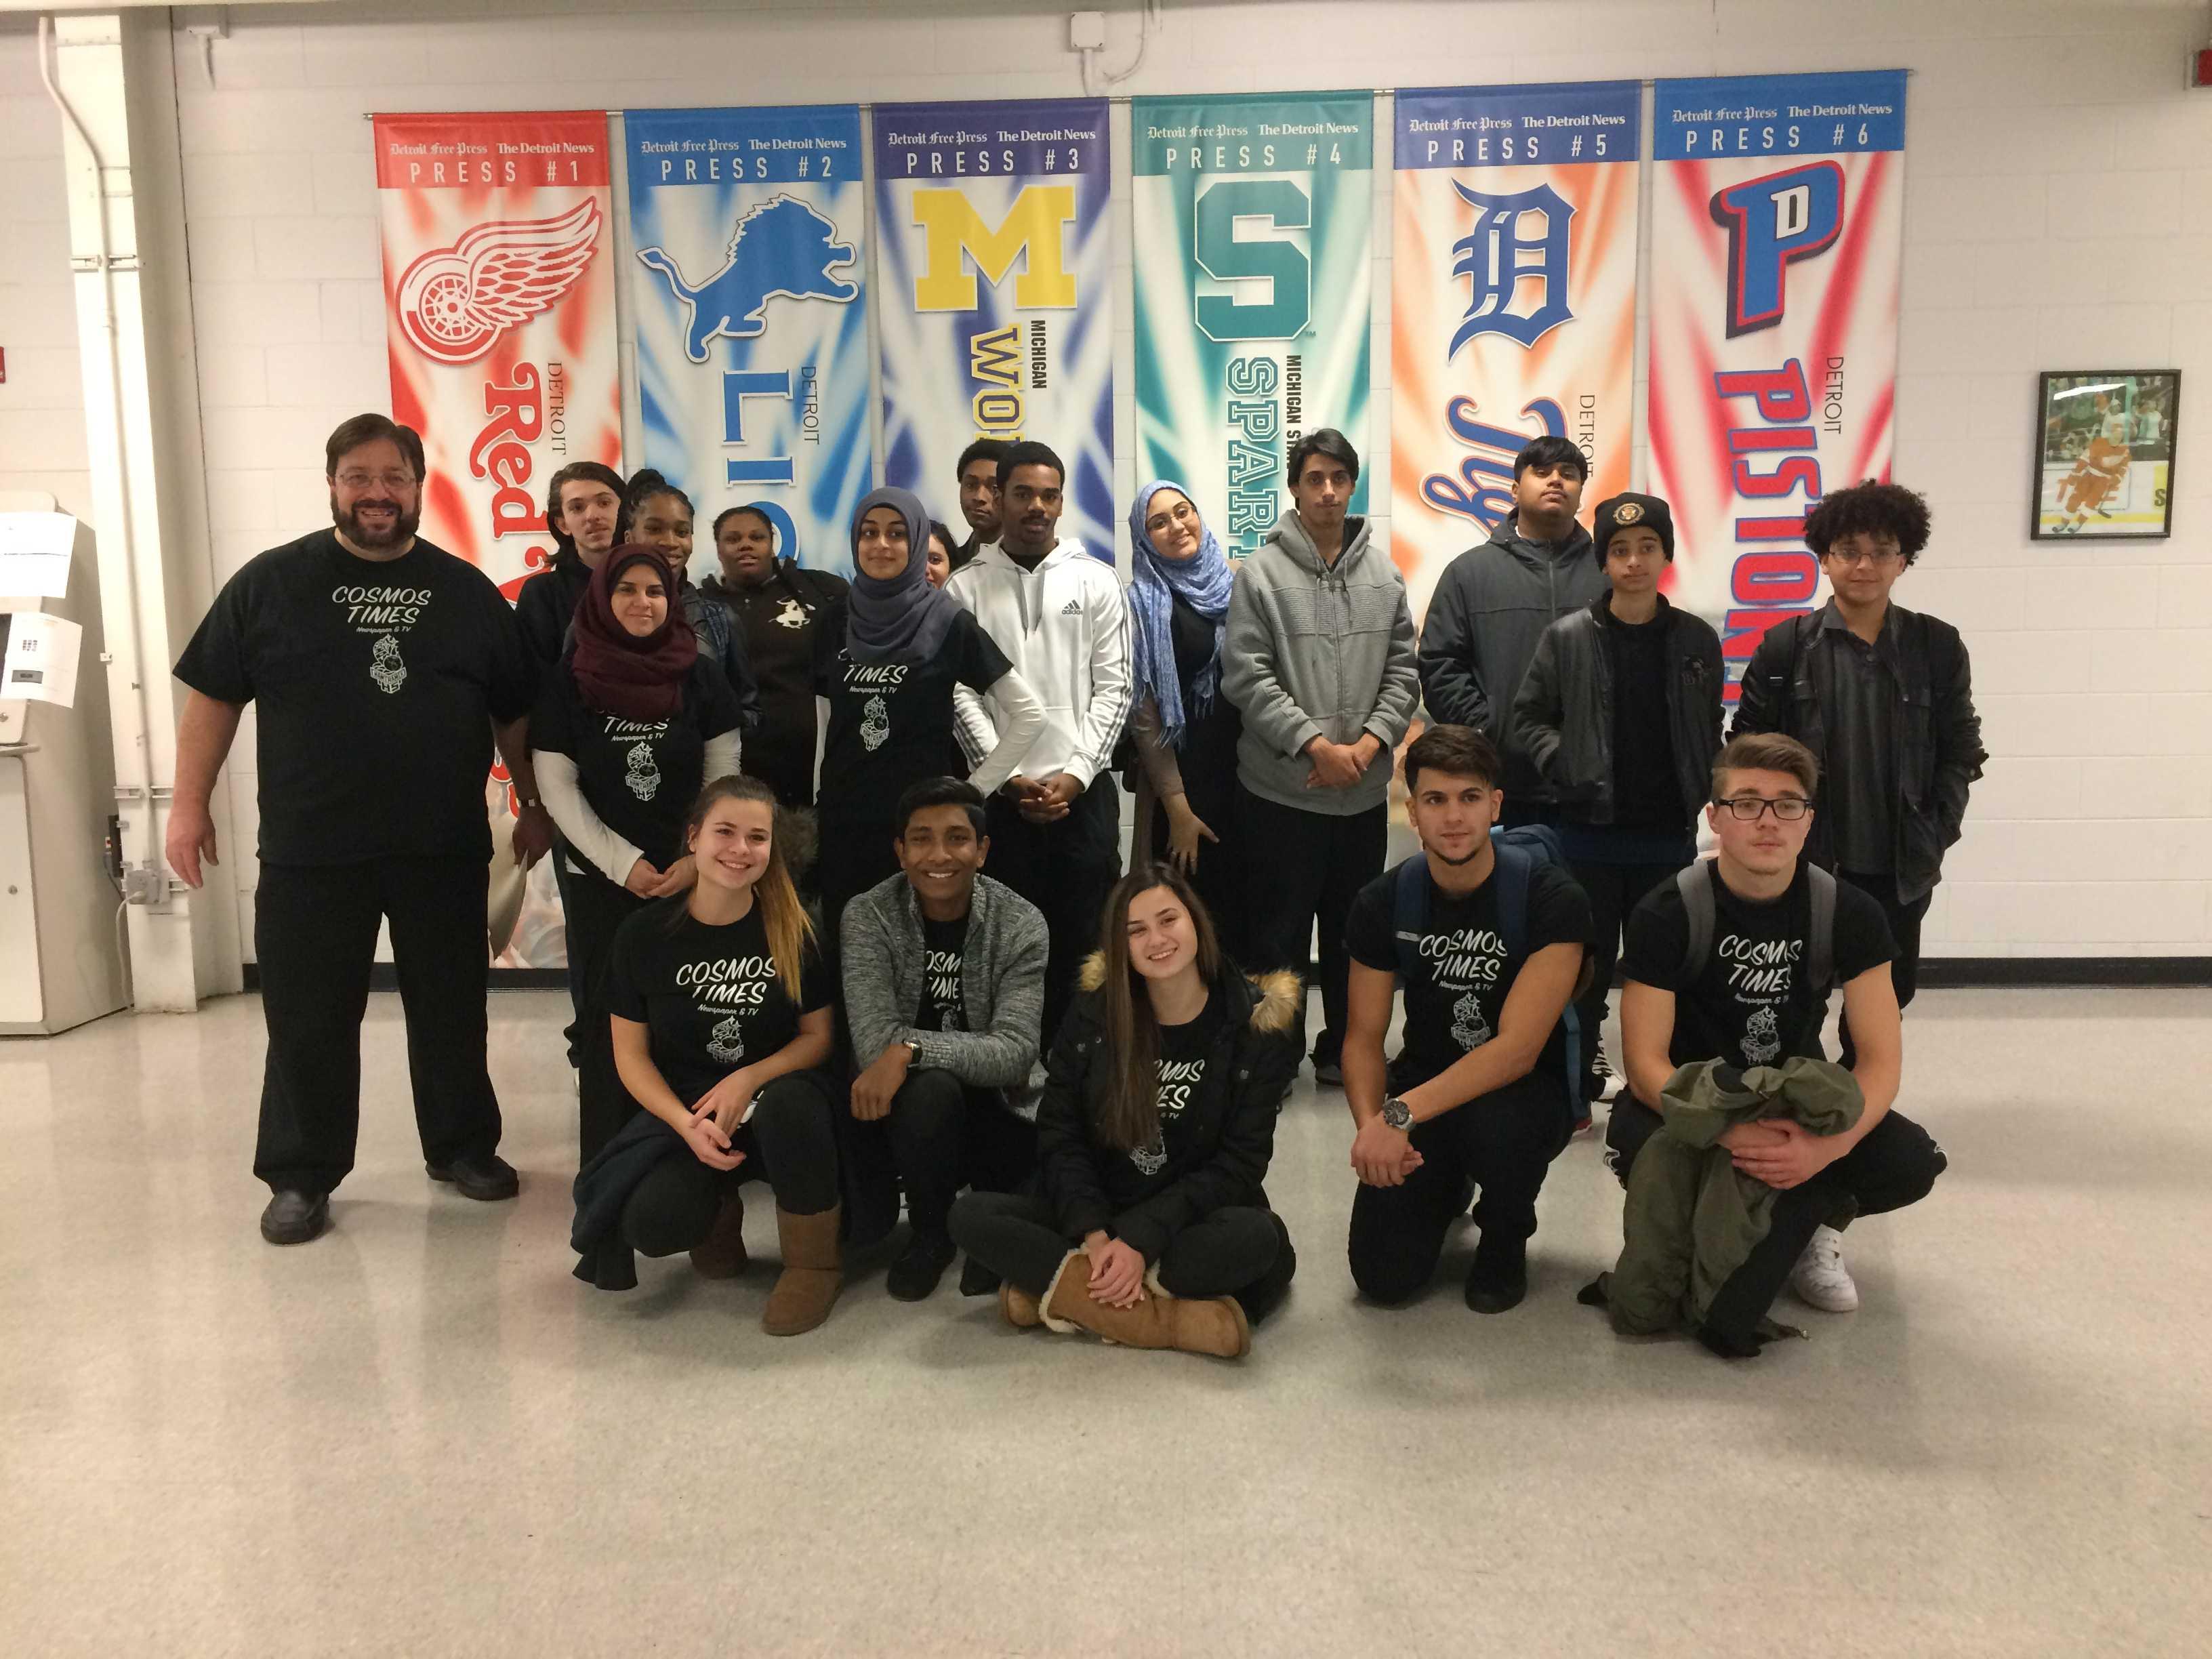 Hamtramck High School Cosmos Times staff